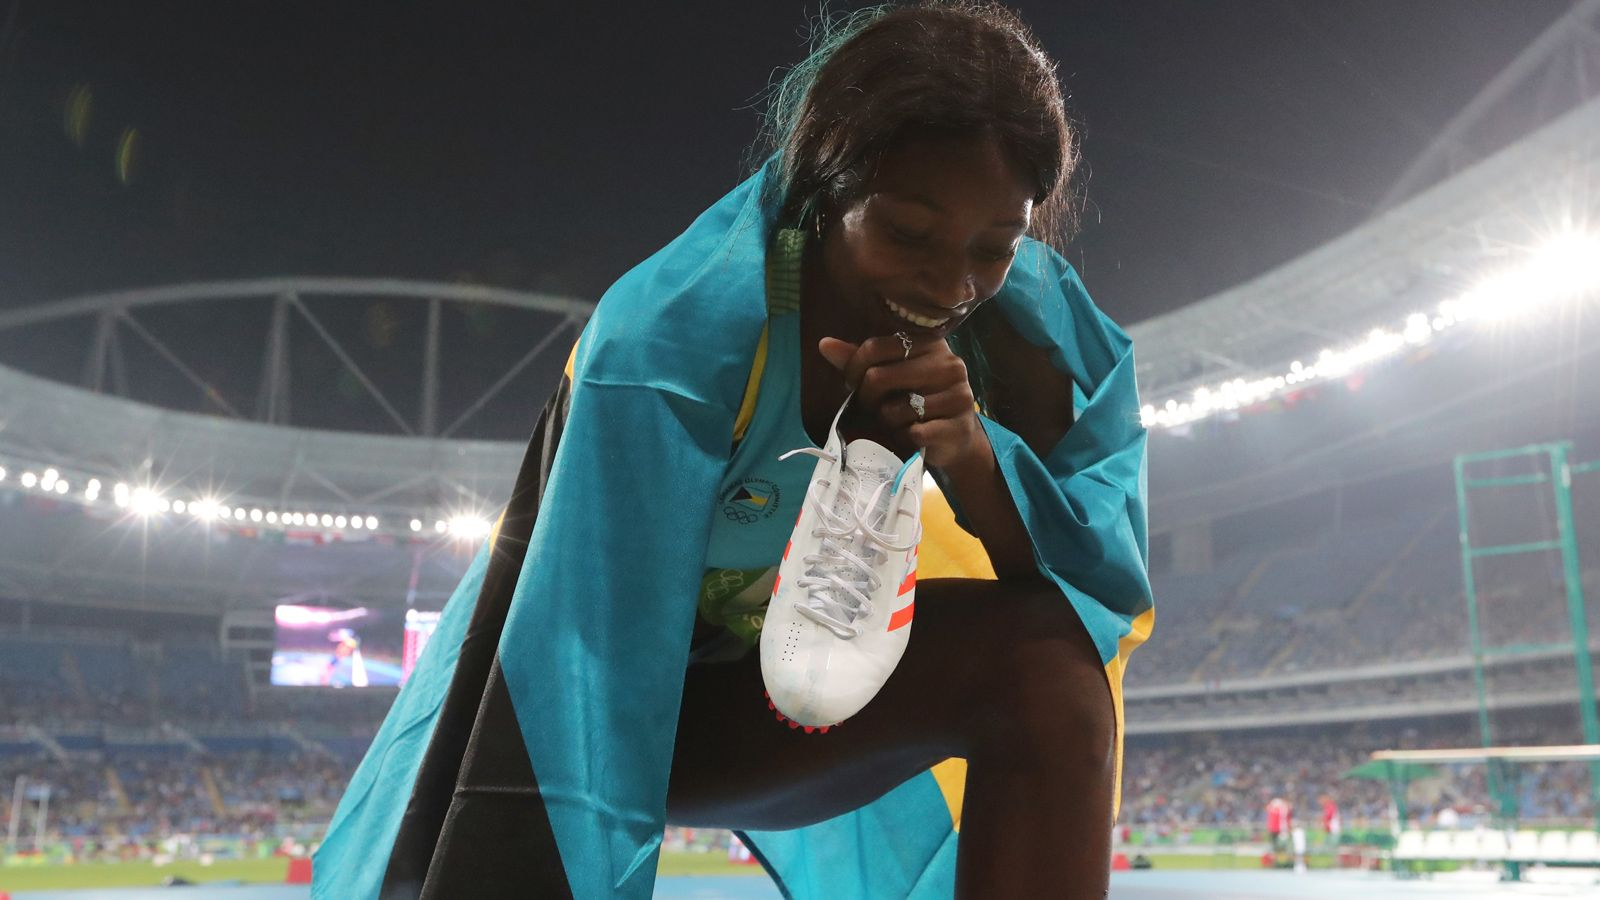 Former Bulldog Shaunae Miller wins Olympic gold